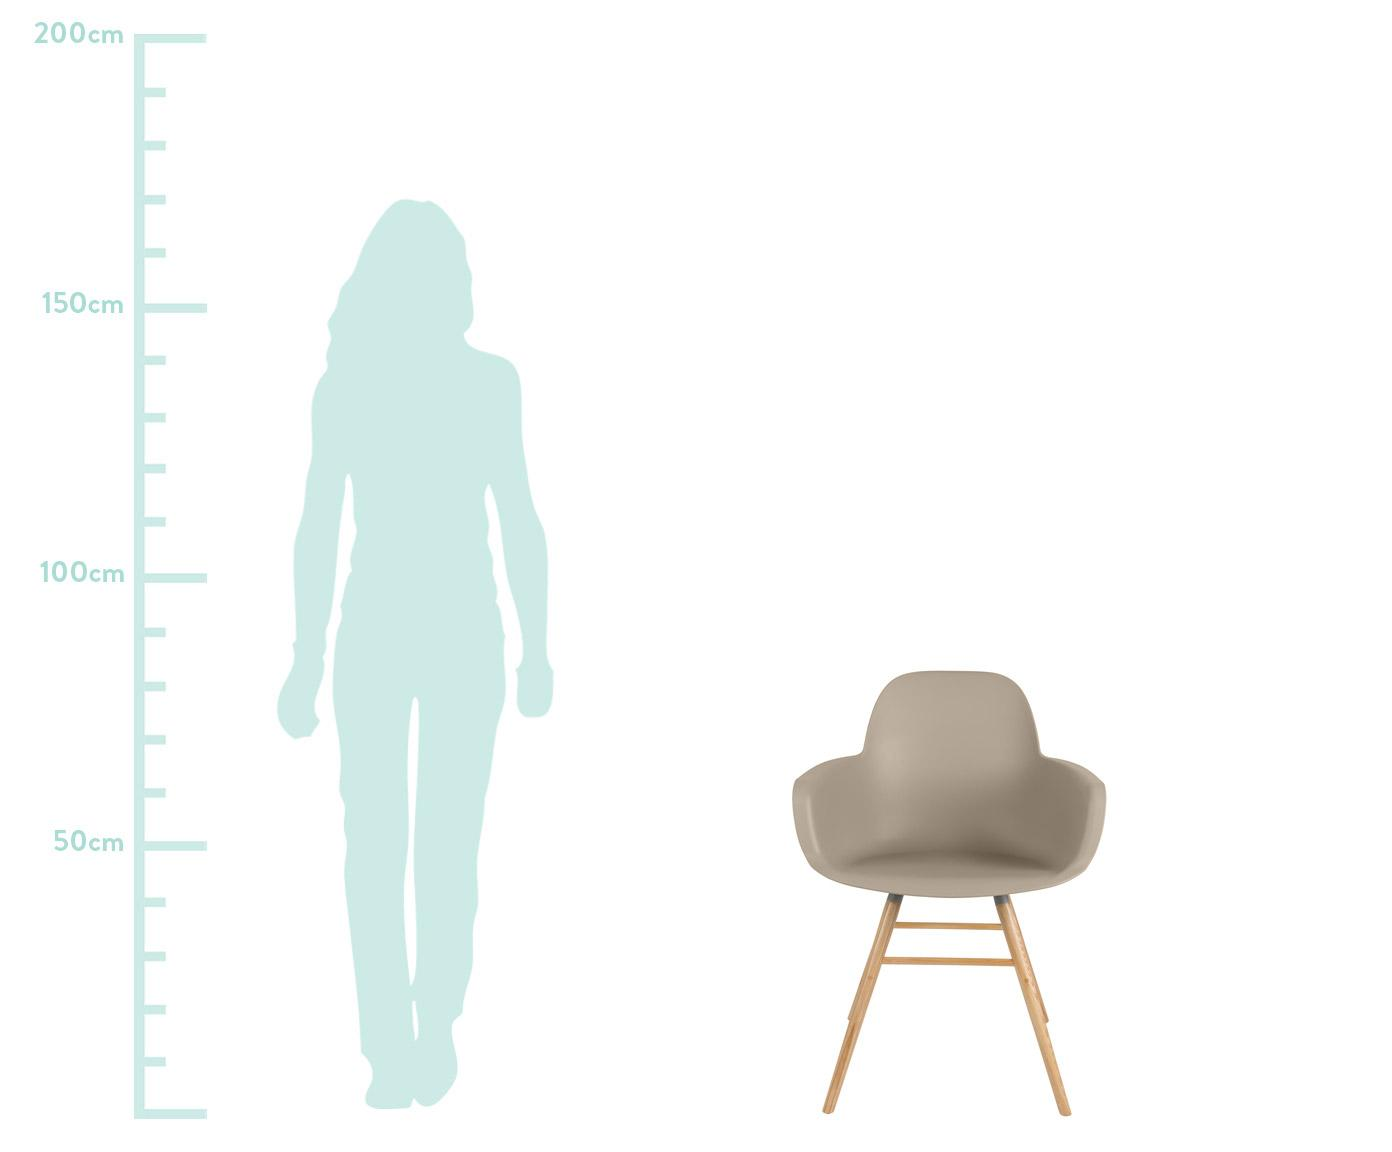 Armlehnstuhl Albert Kuip mit Holzbeinen, Sitzfläche: 100% Polypropylen, Füße: Eschenholz, Taupe, B 59 x T 55 cm